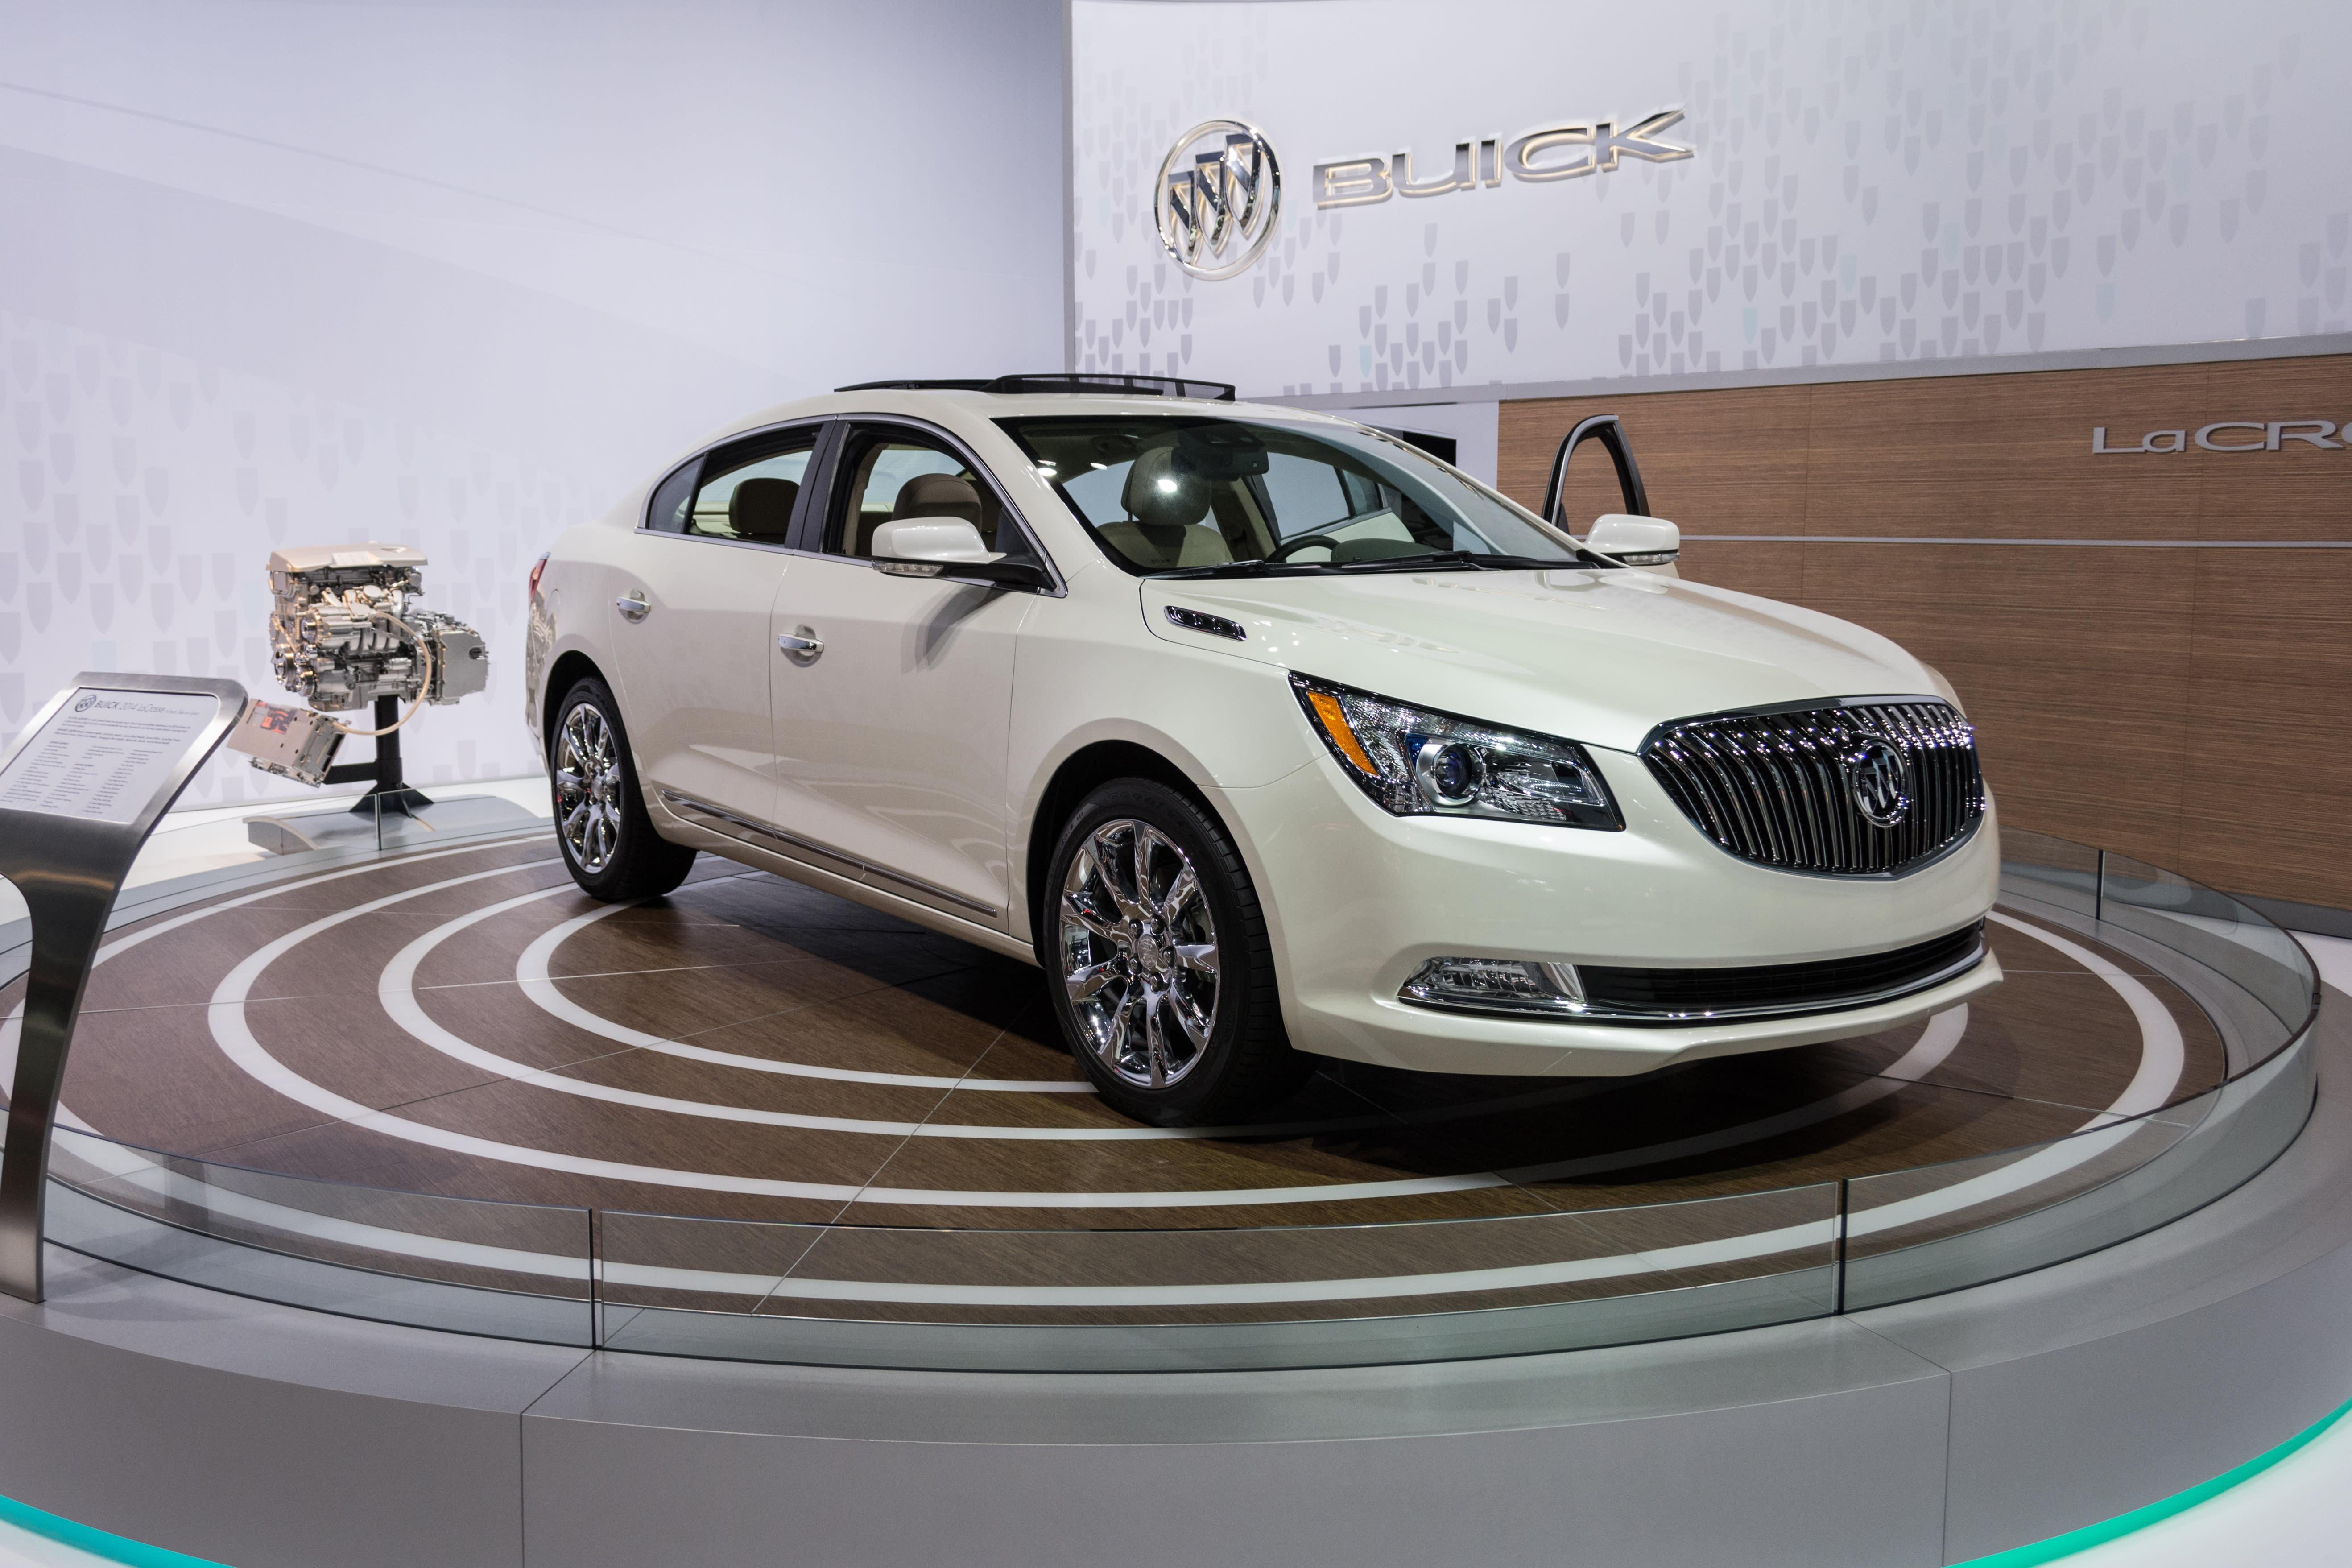 GM Recalls Buick Sedan Due to Power Steering Defect